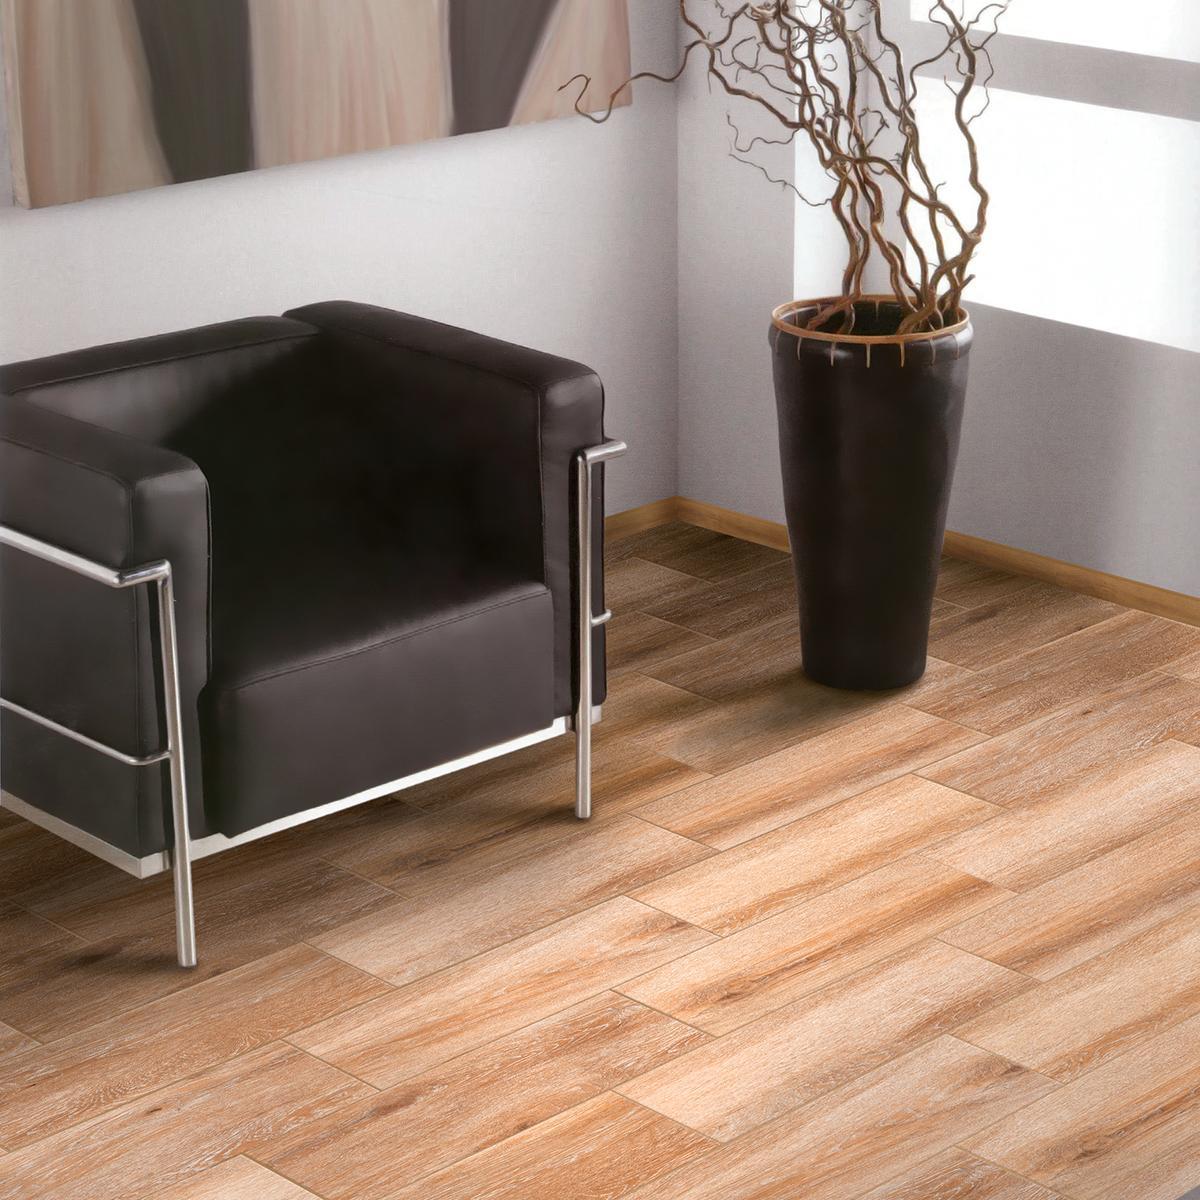 Piso Excellence Beige Mate - 20X61 cm - 1.61 m2